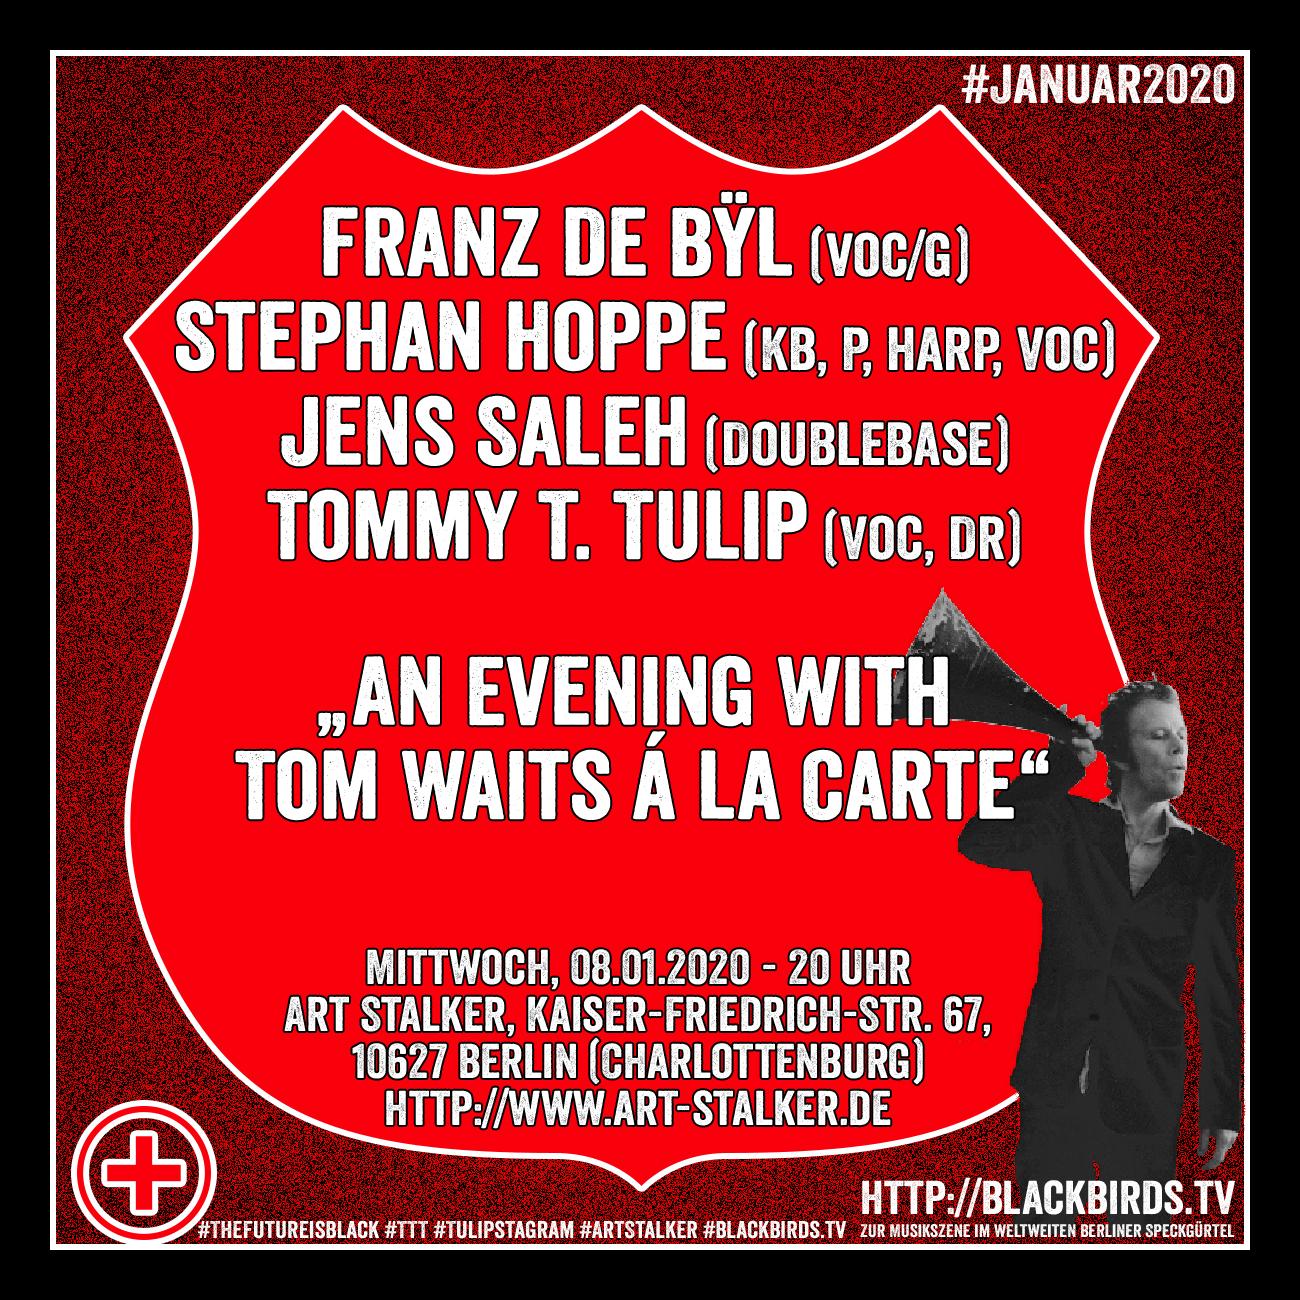 "Gigpreview Am Mittwoch, 08.01.2020 um 20 Uhr: Franz de Bÿl & #Vinÿl ""Tom Waits á la carte"" im #ArtStalker"